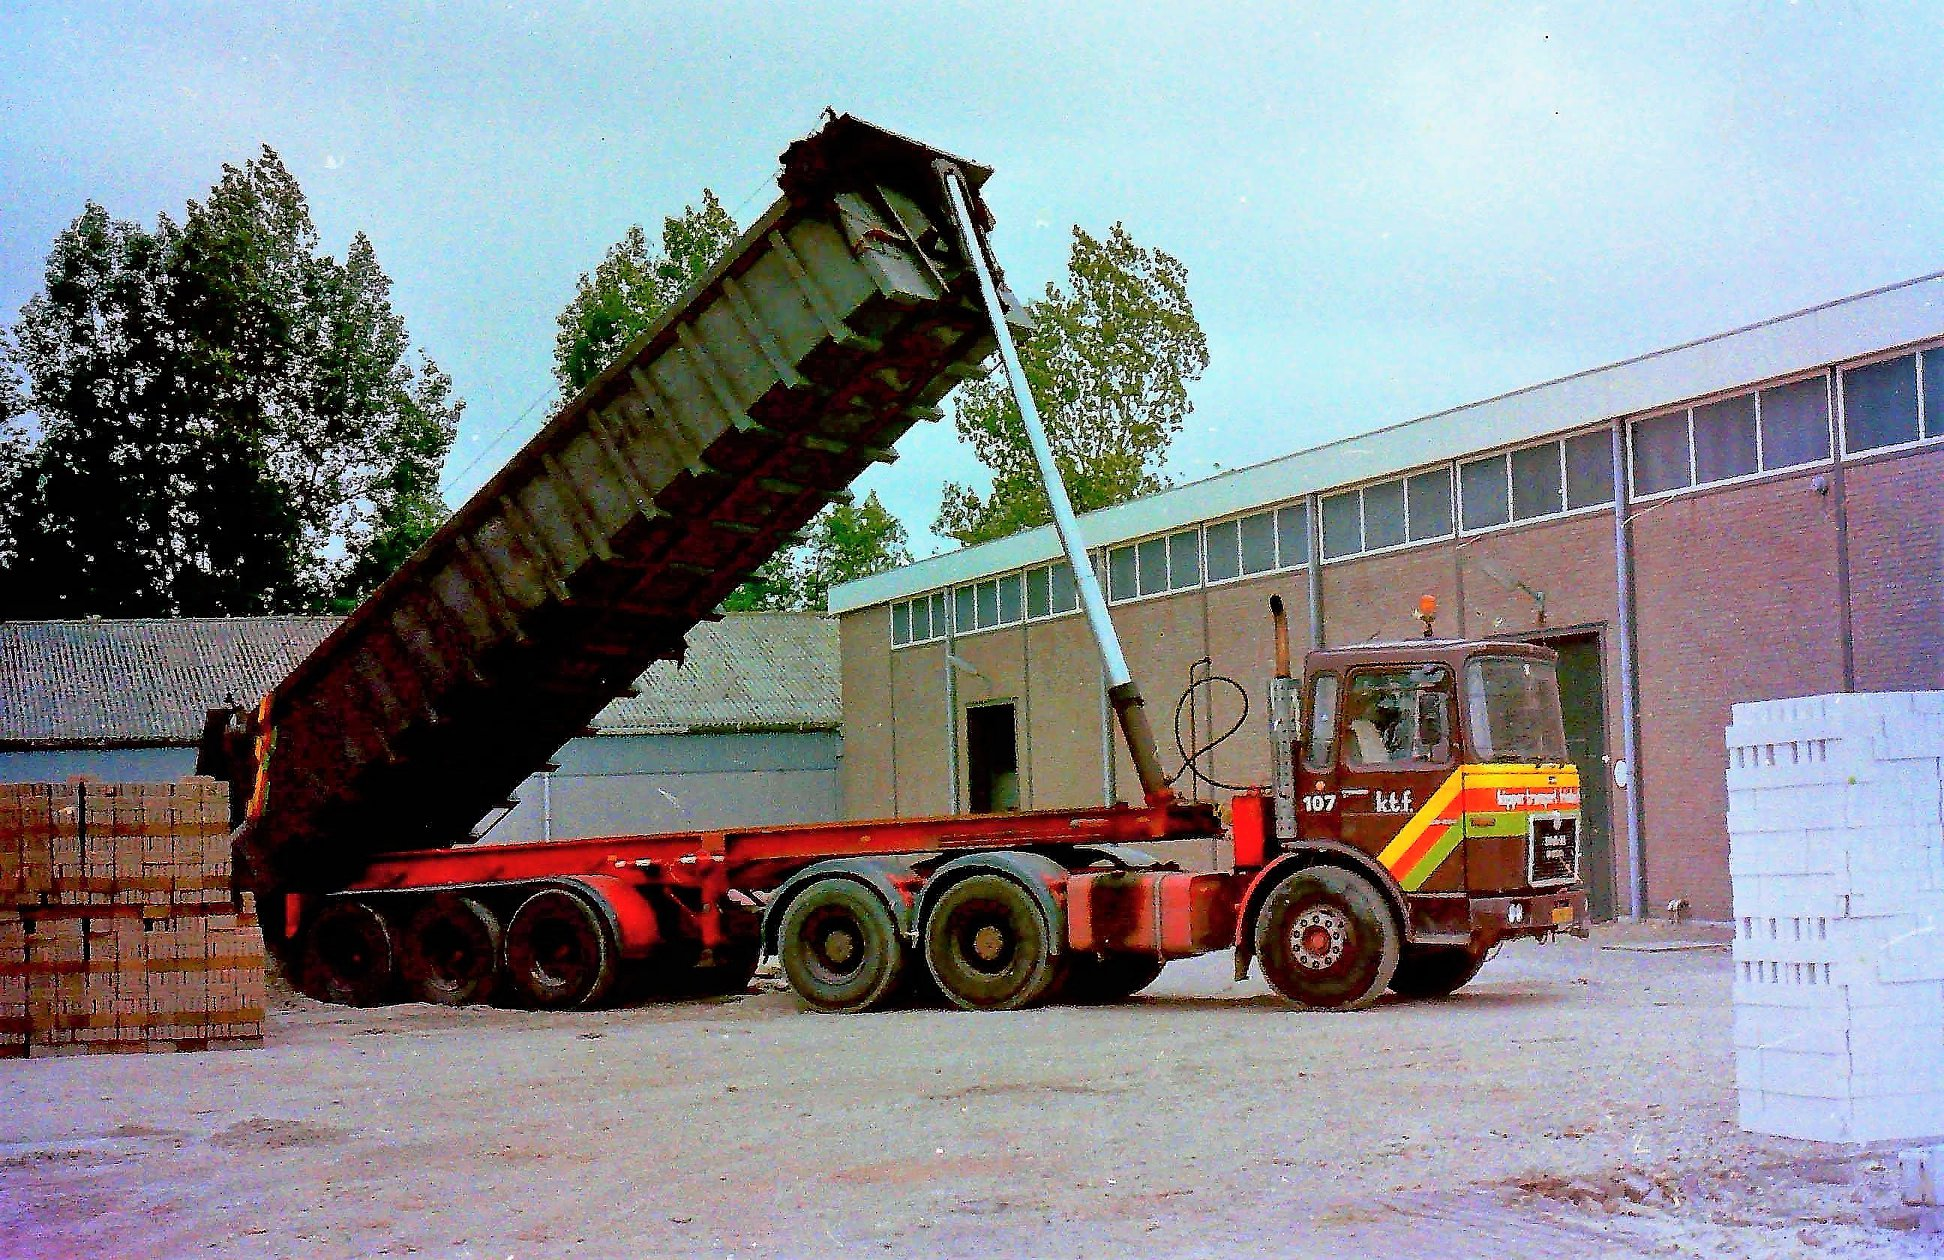 MAN-Kipper-transport-Friesland-bij-het-oude-bedrijfspand